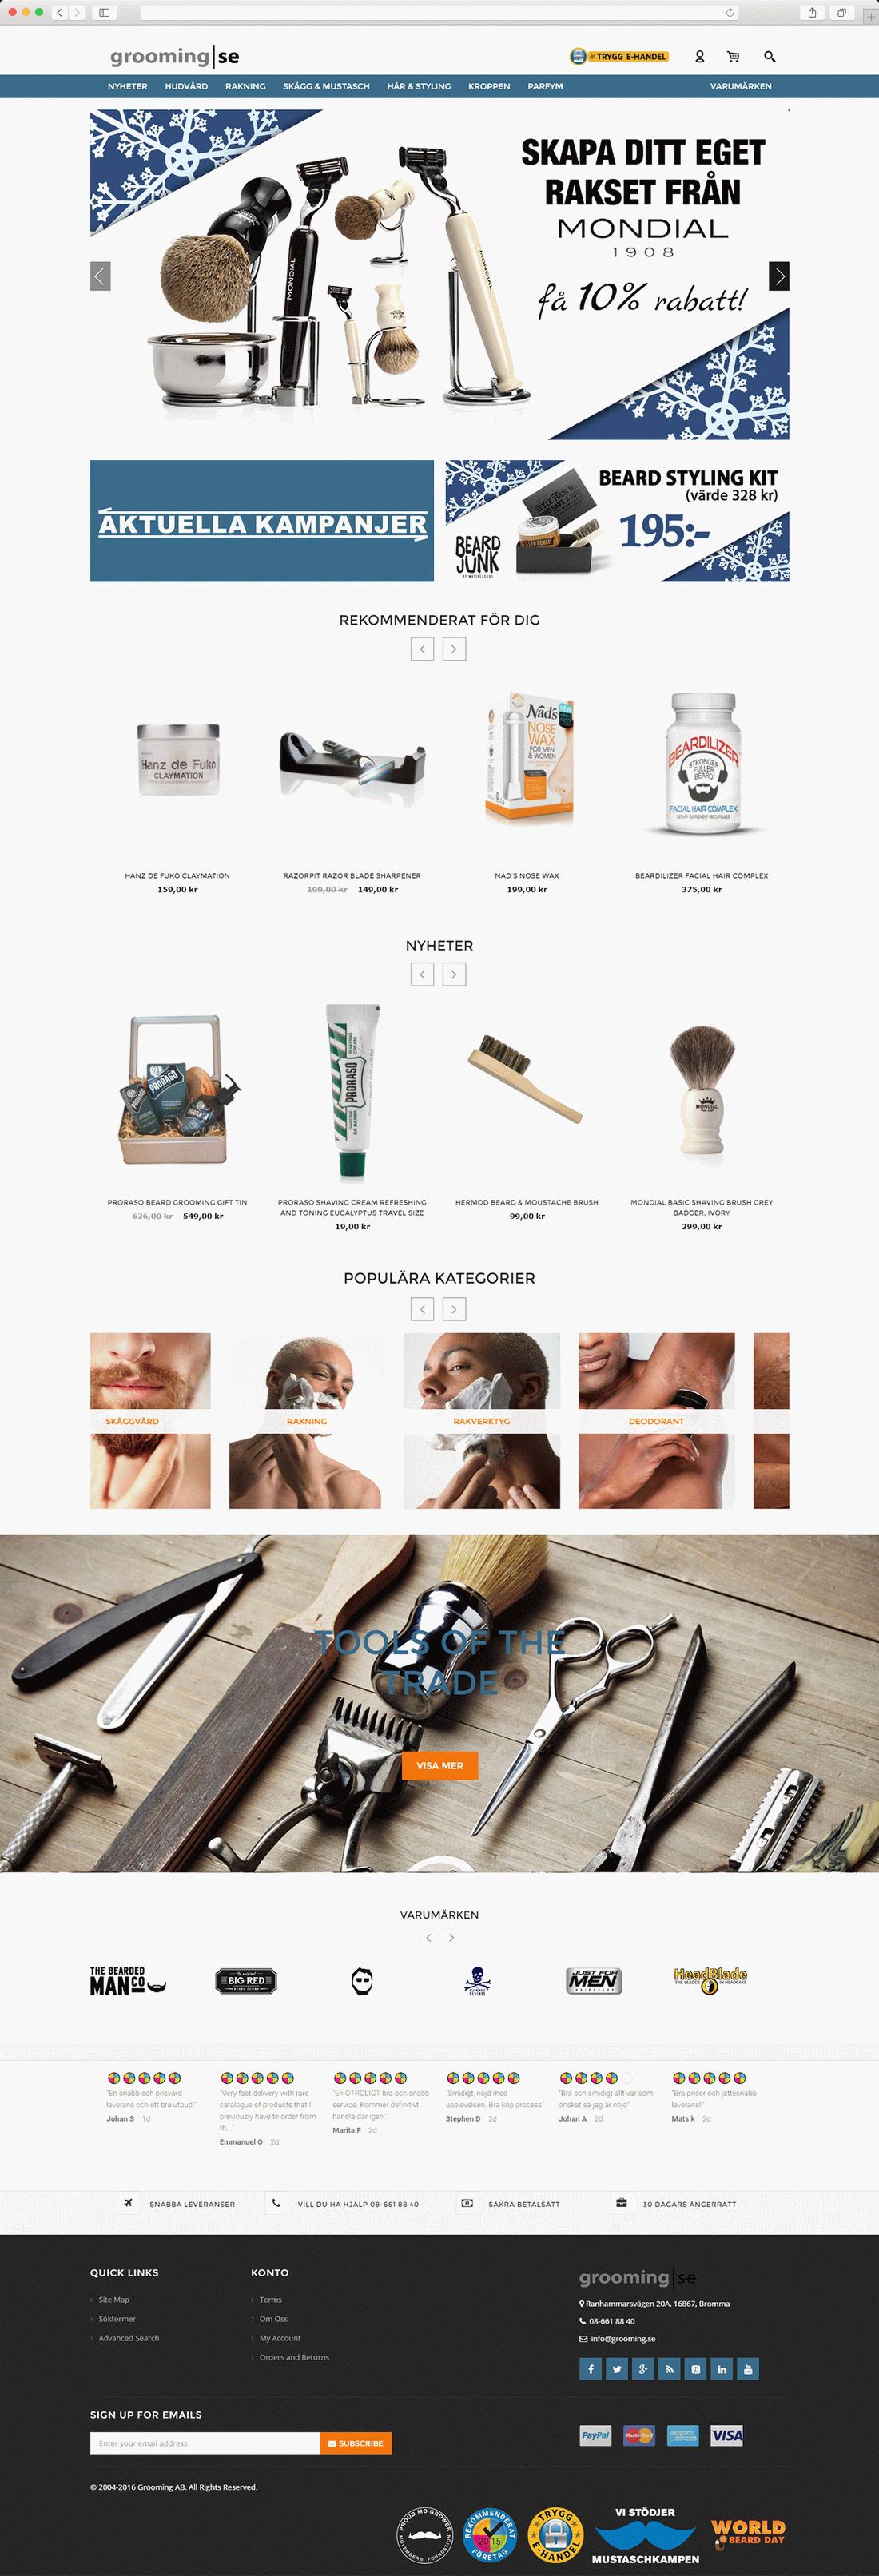 grooming_home